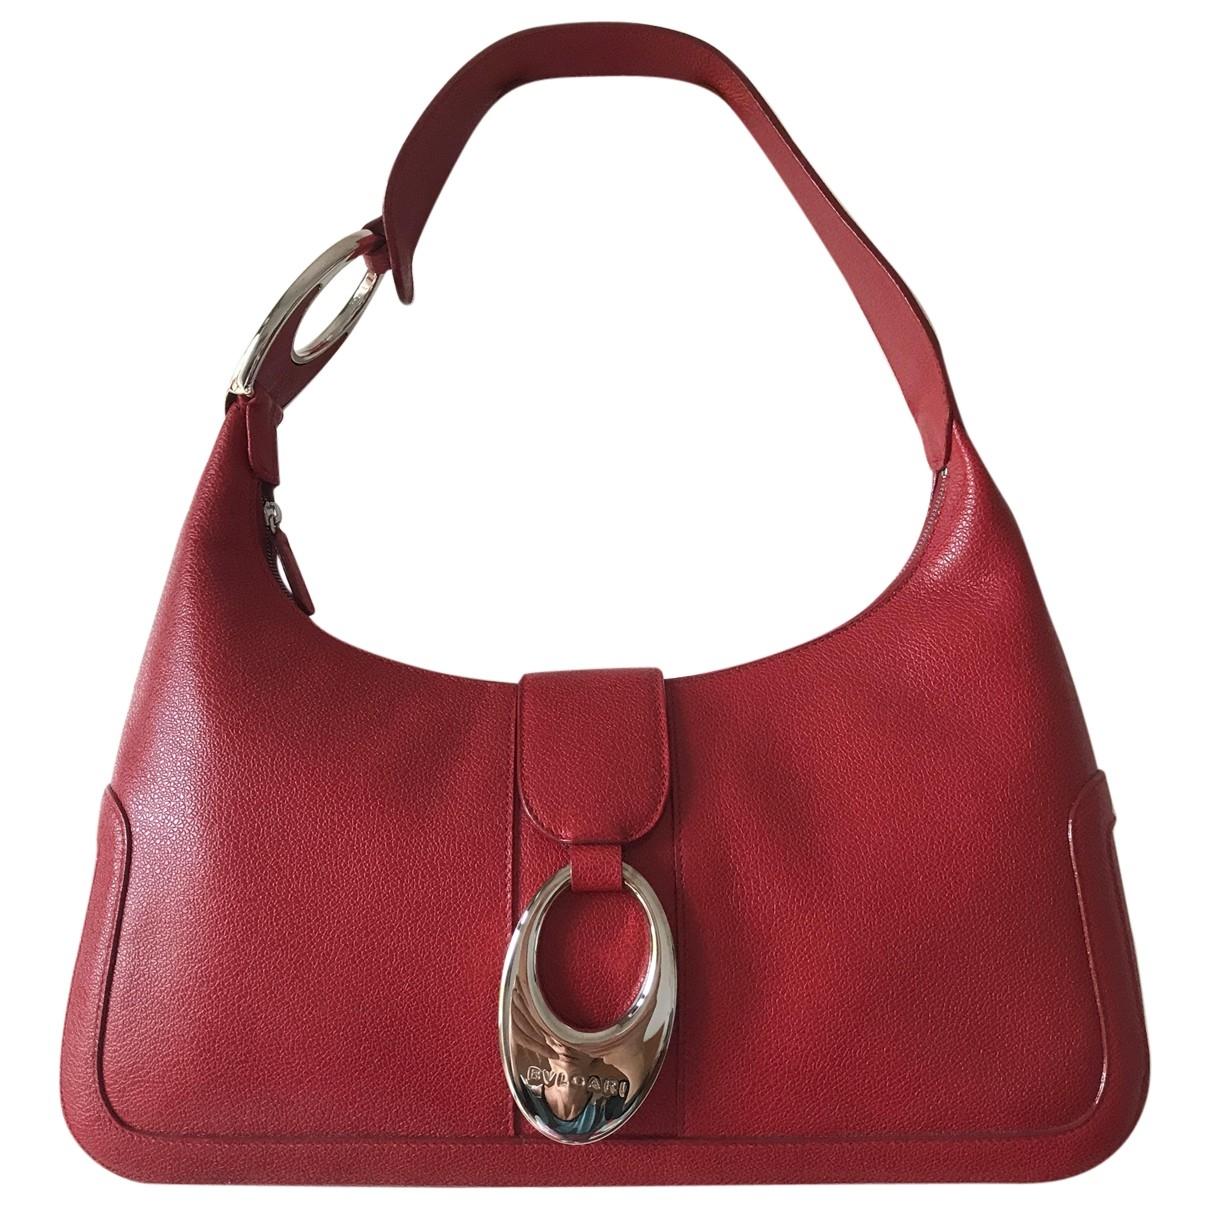 Bvlgari \N Red Leather handbag for Women \N